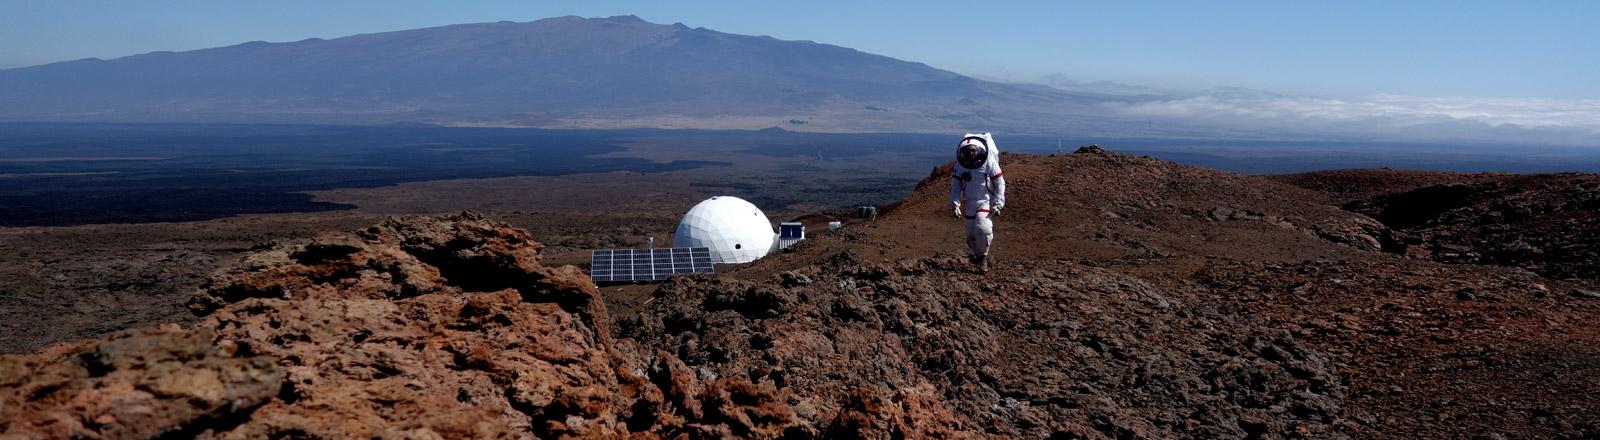 Christiane Heinicke im Raumanzug auf Hawaii